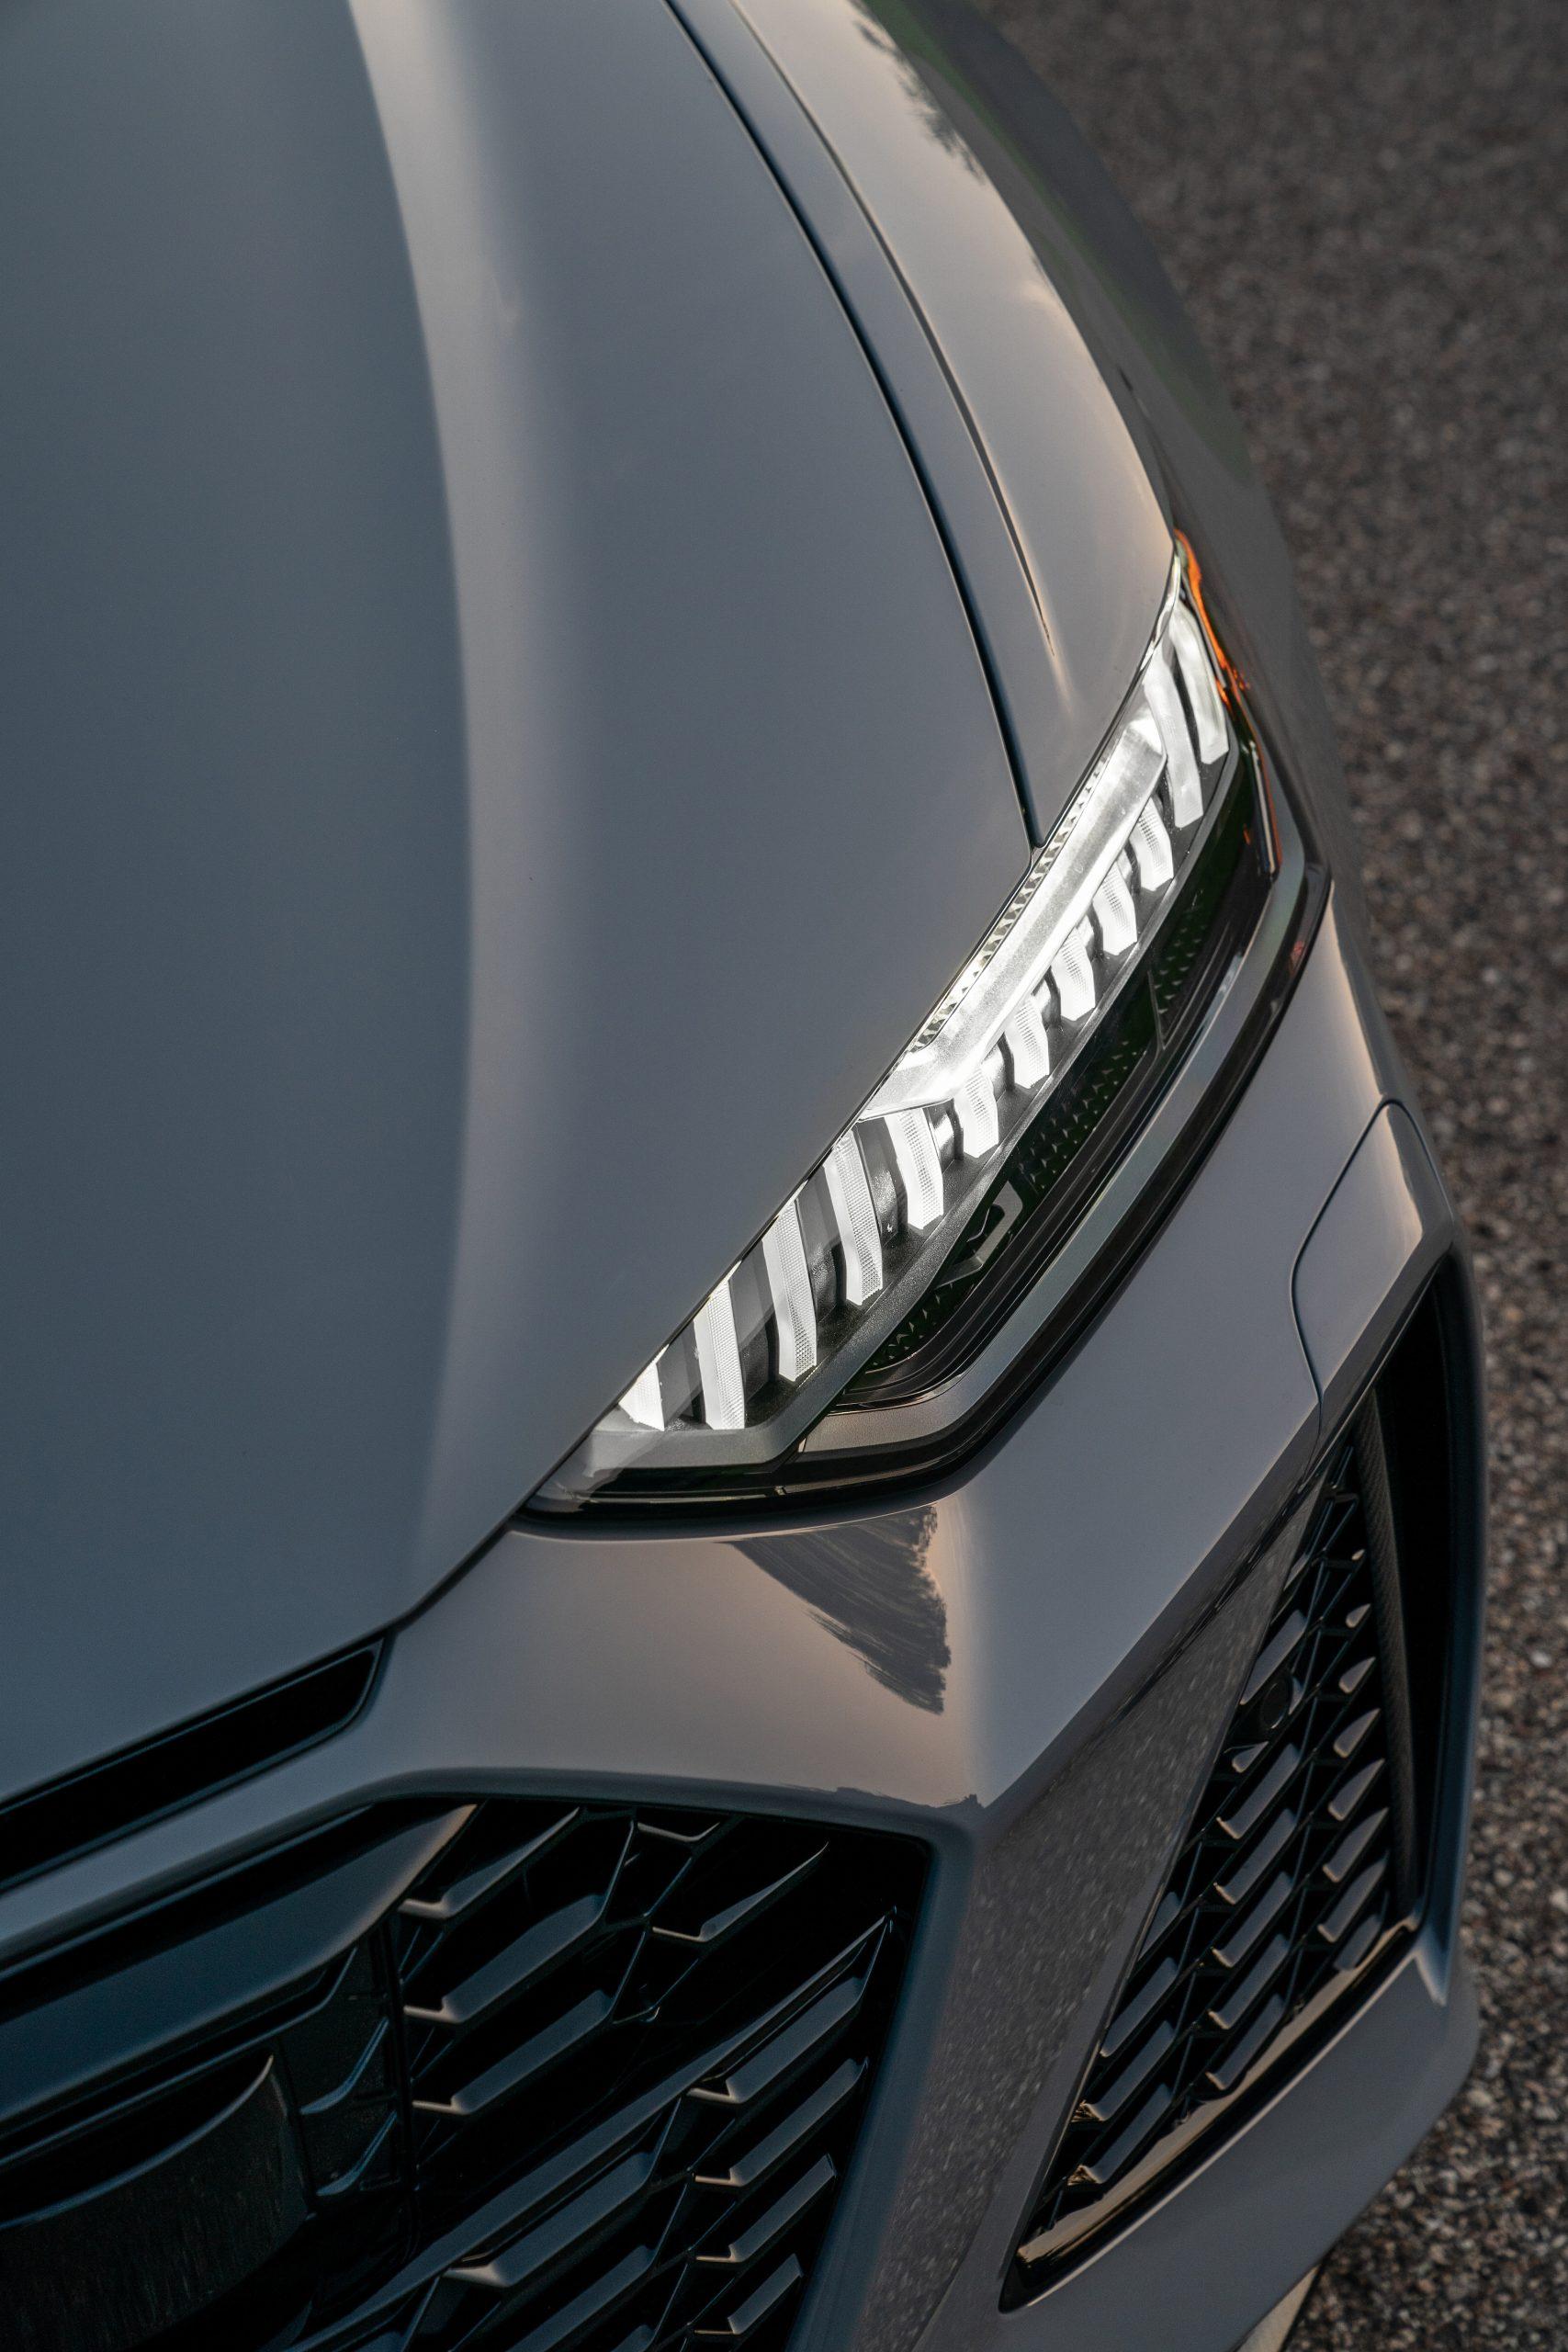 RS 6 Avant Nardo Gray headlight detail